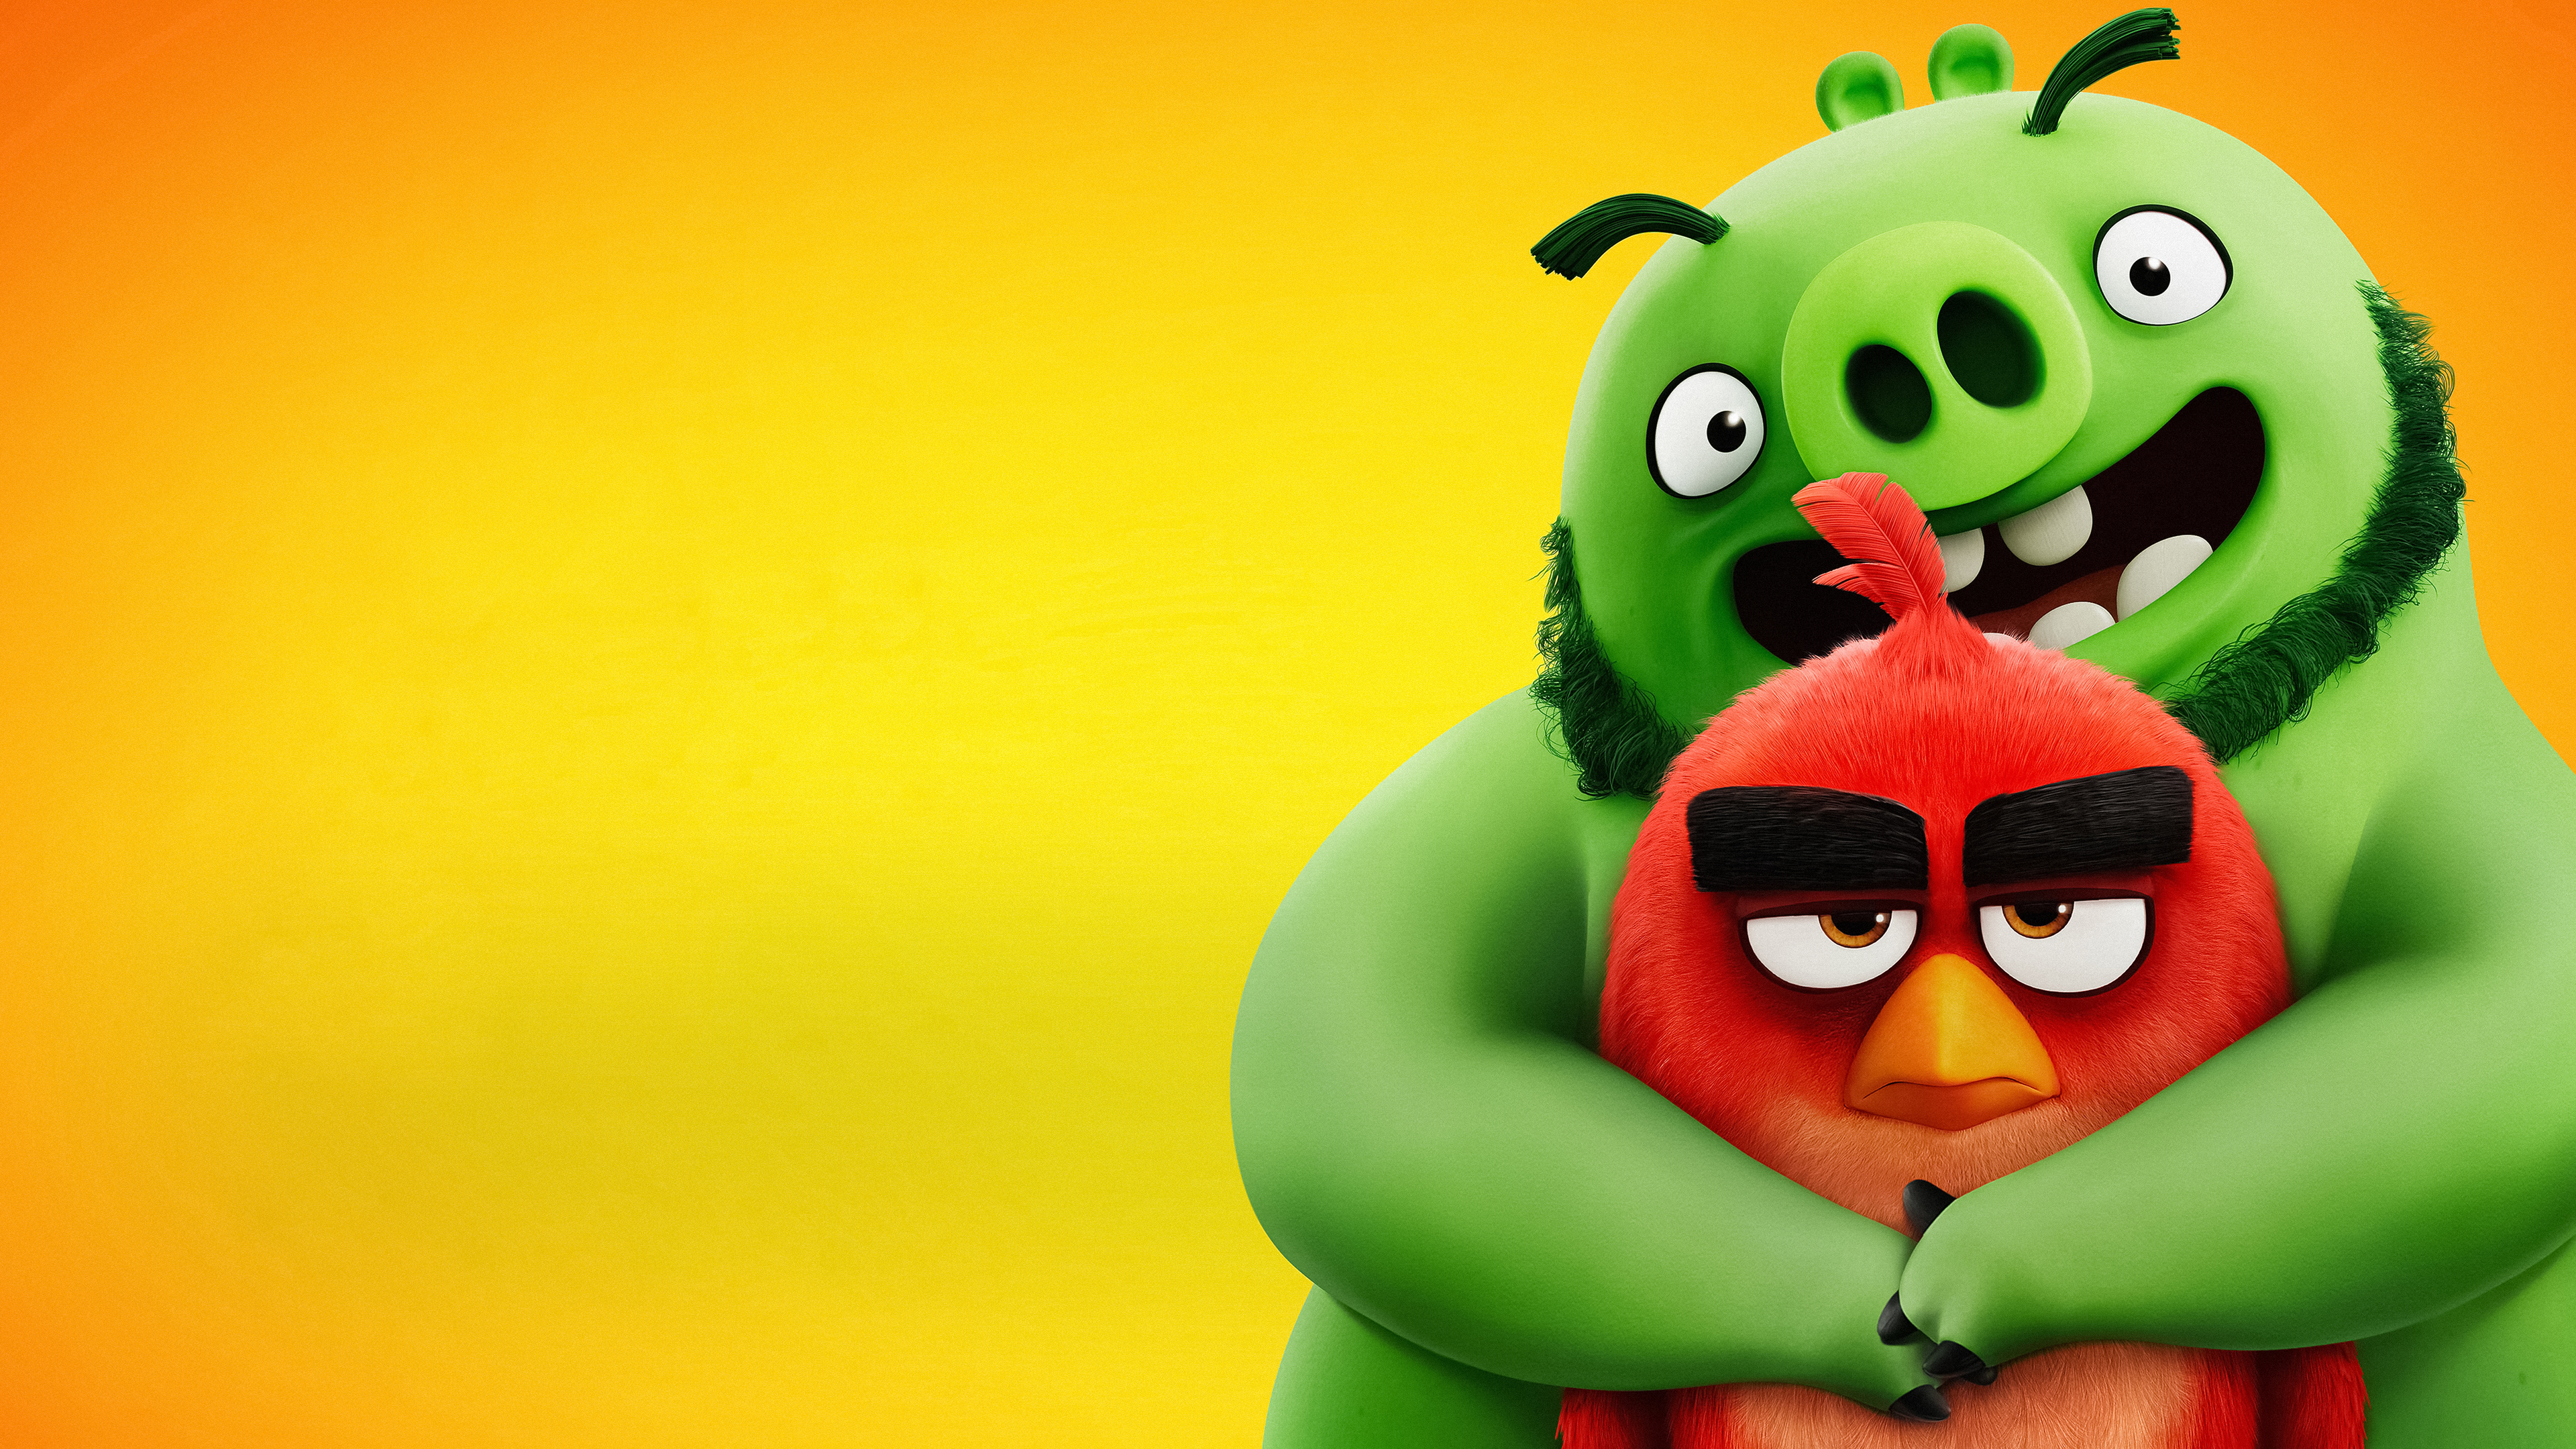 the angry birds movie 2 2019 1563220873 - The Angry Birds Movie 2 2019 - the angry birds movie 2 wallpapers, the angry birds 2 wallpapers, movies wallpapers, hd-wallpapers, angry birds wallpapers, 5k wallpapers, 4k-wallpapers, 2019 movies wallpapers